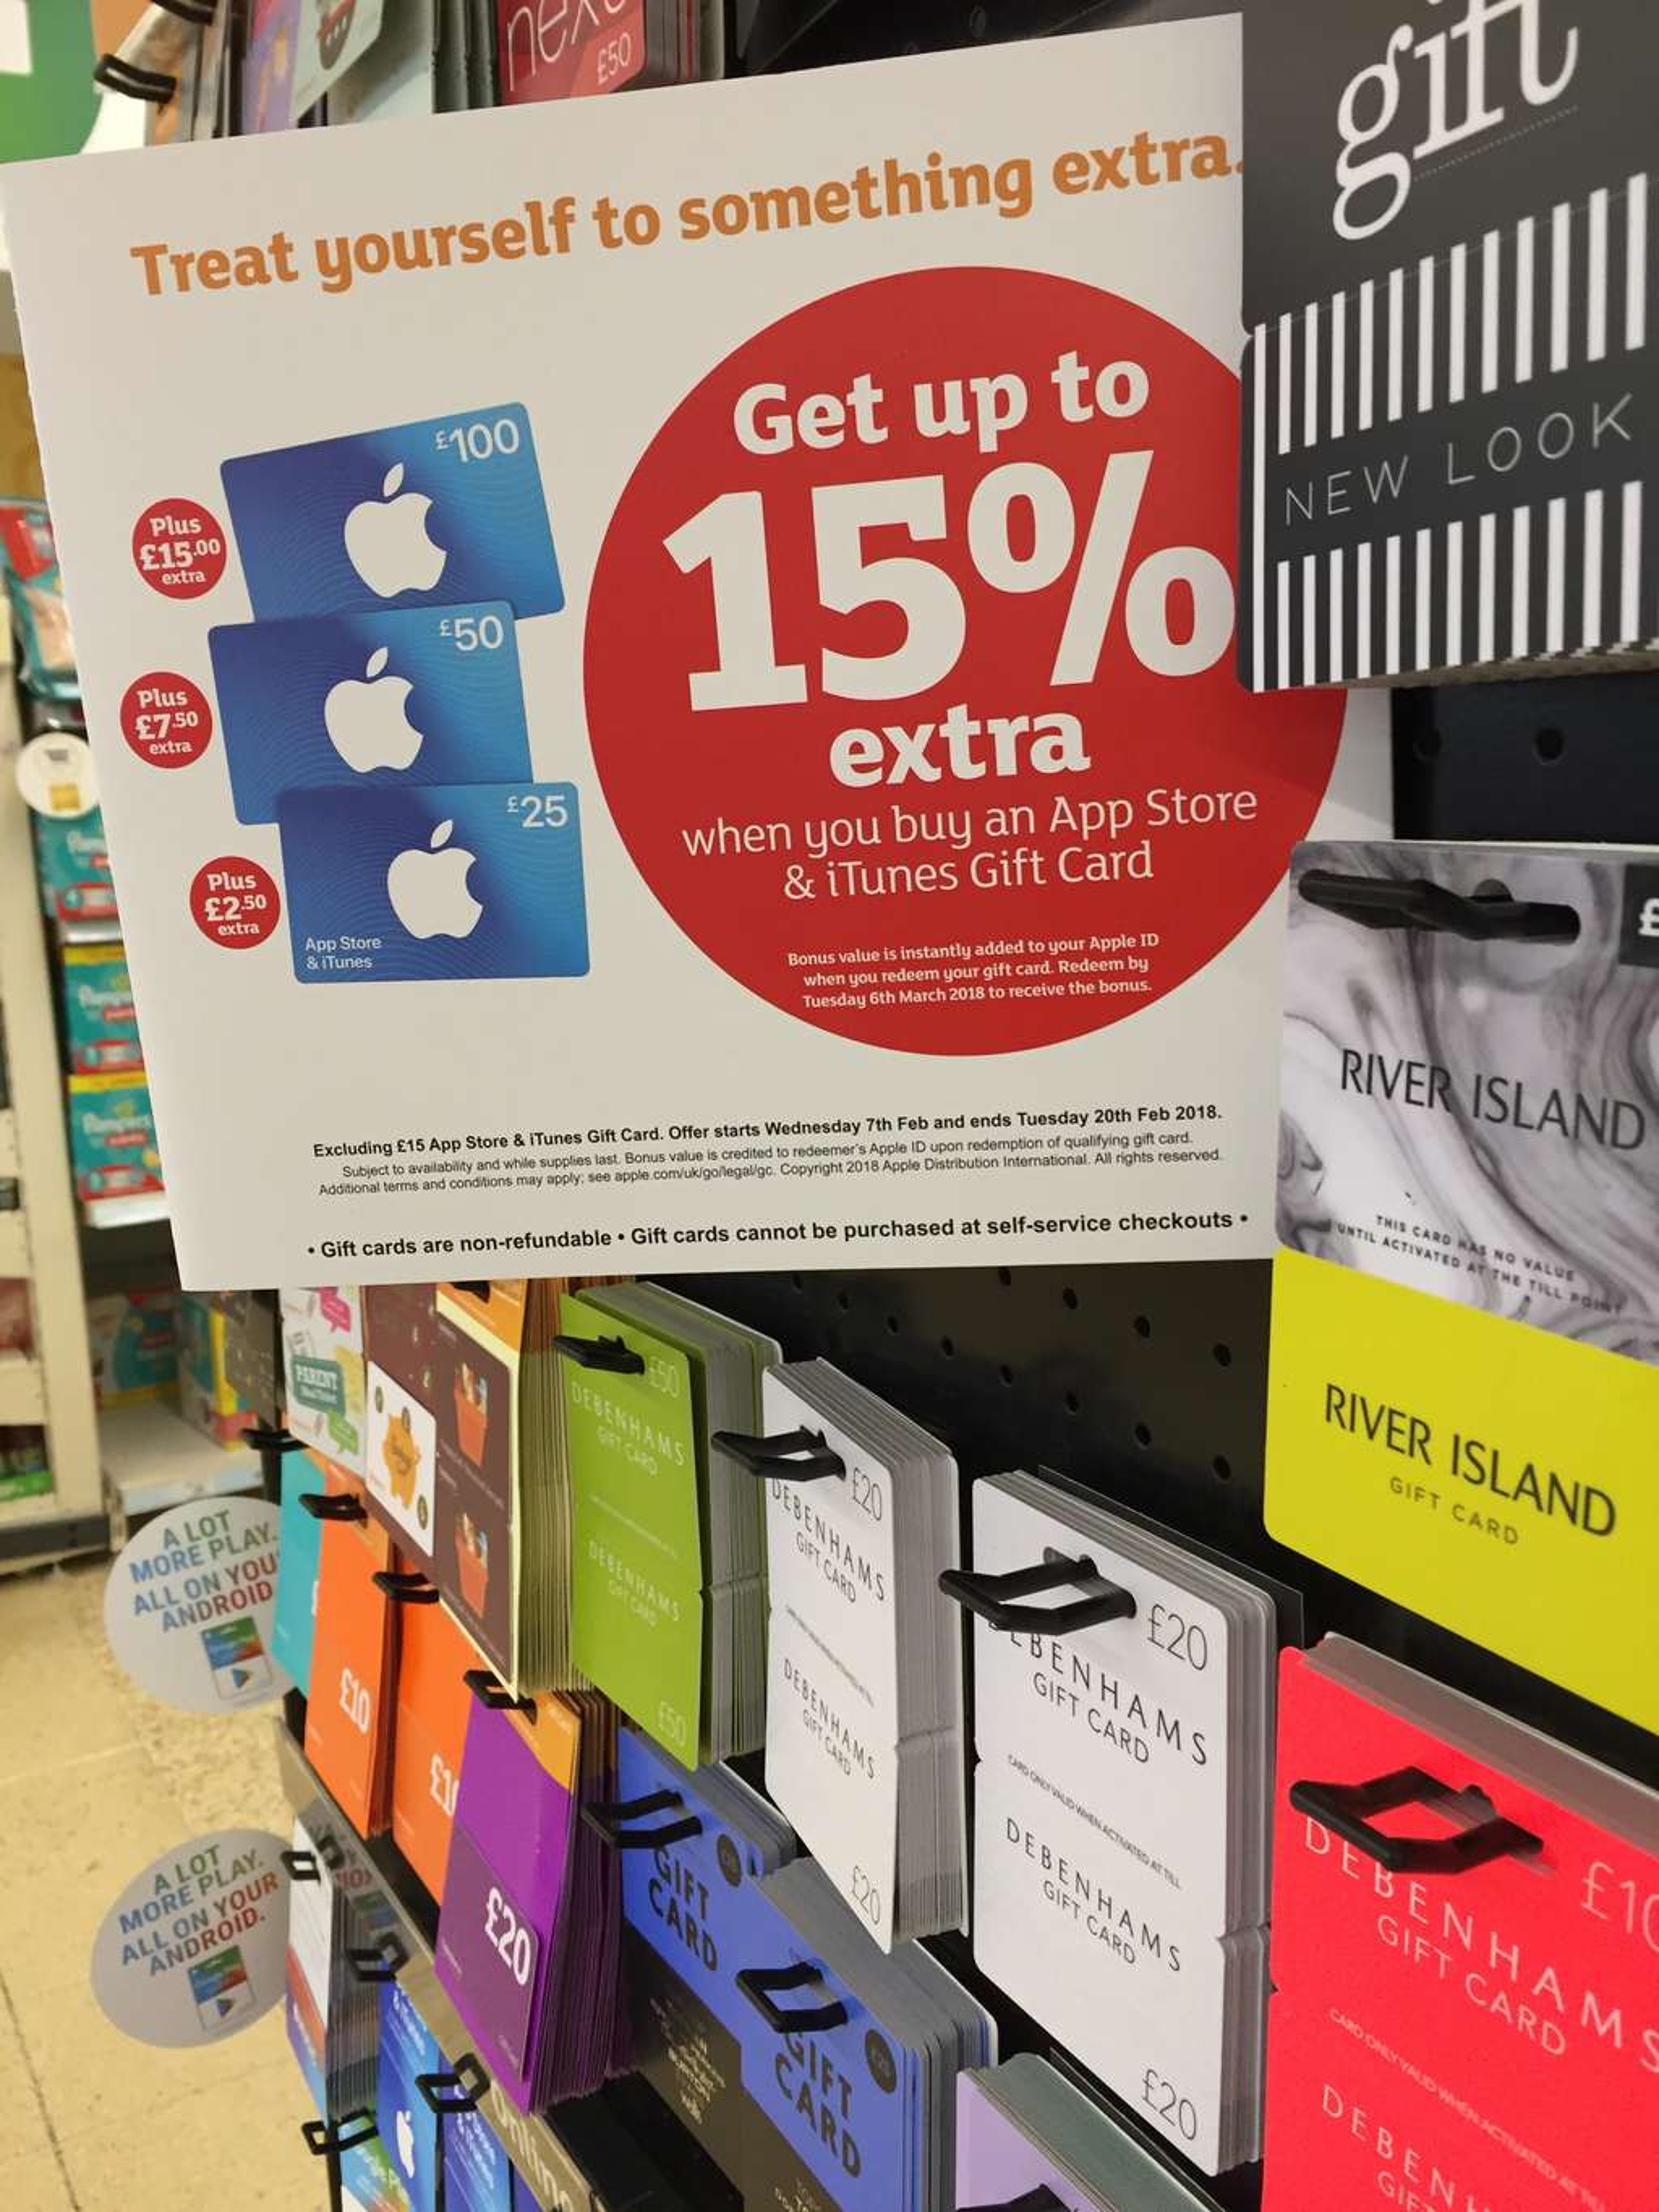 Upto 15 Extra On Itunes App Store Gift Card Sainsbury Instore Us 50 Hotukdeals